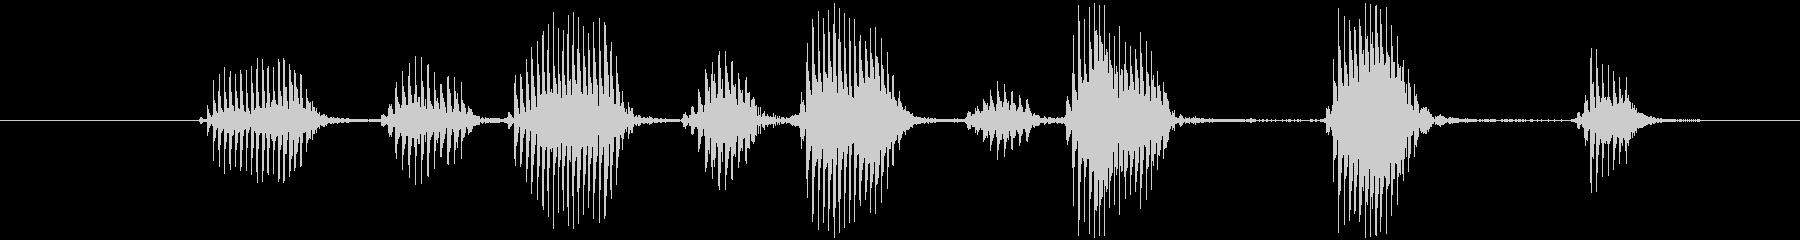 FX ギグルチューブシーケンス03の未再生の波形